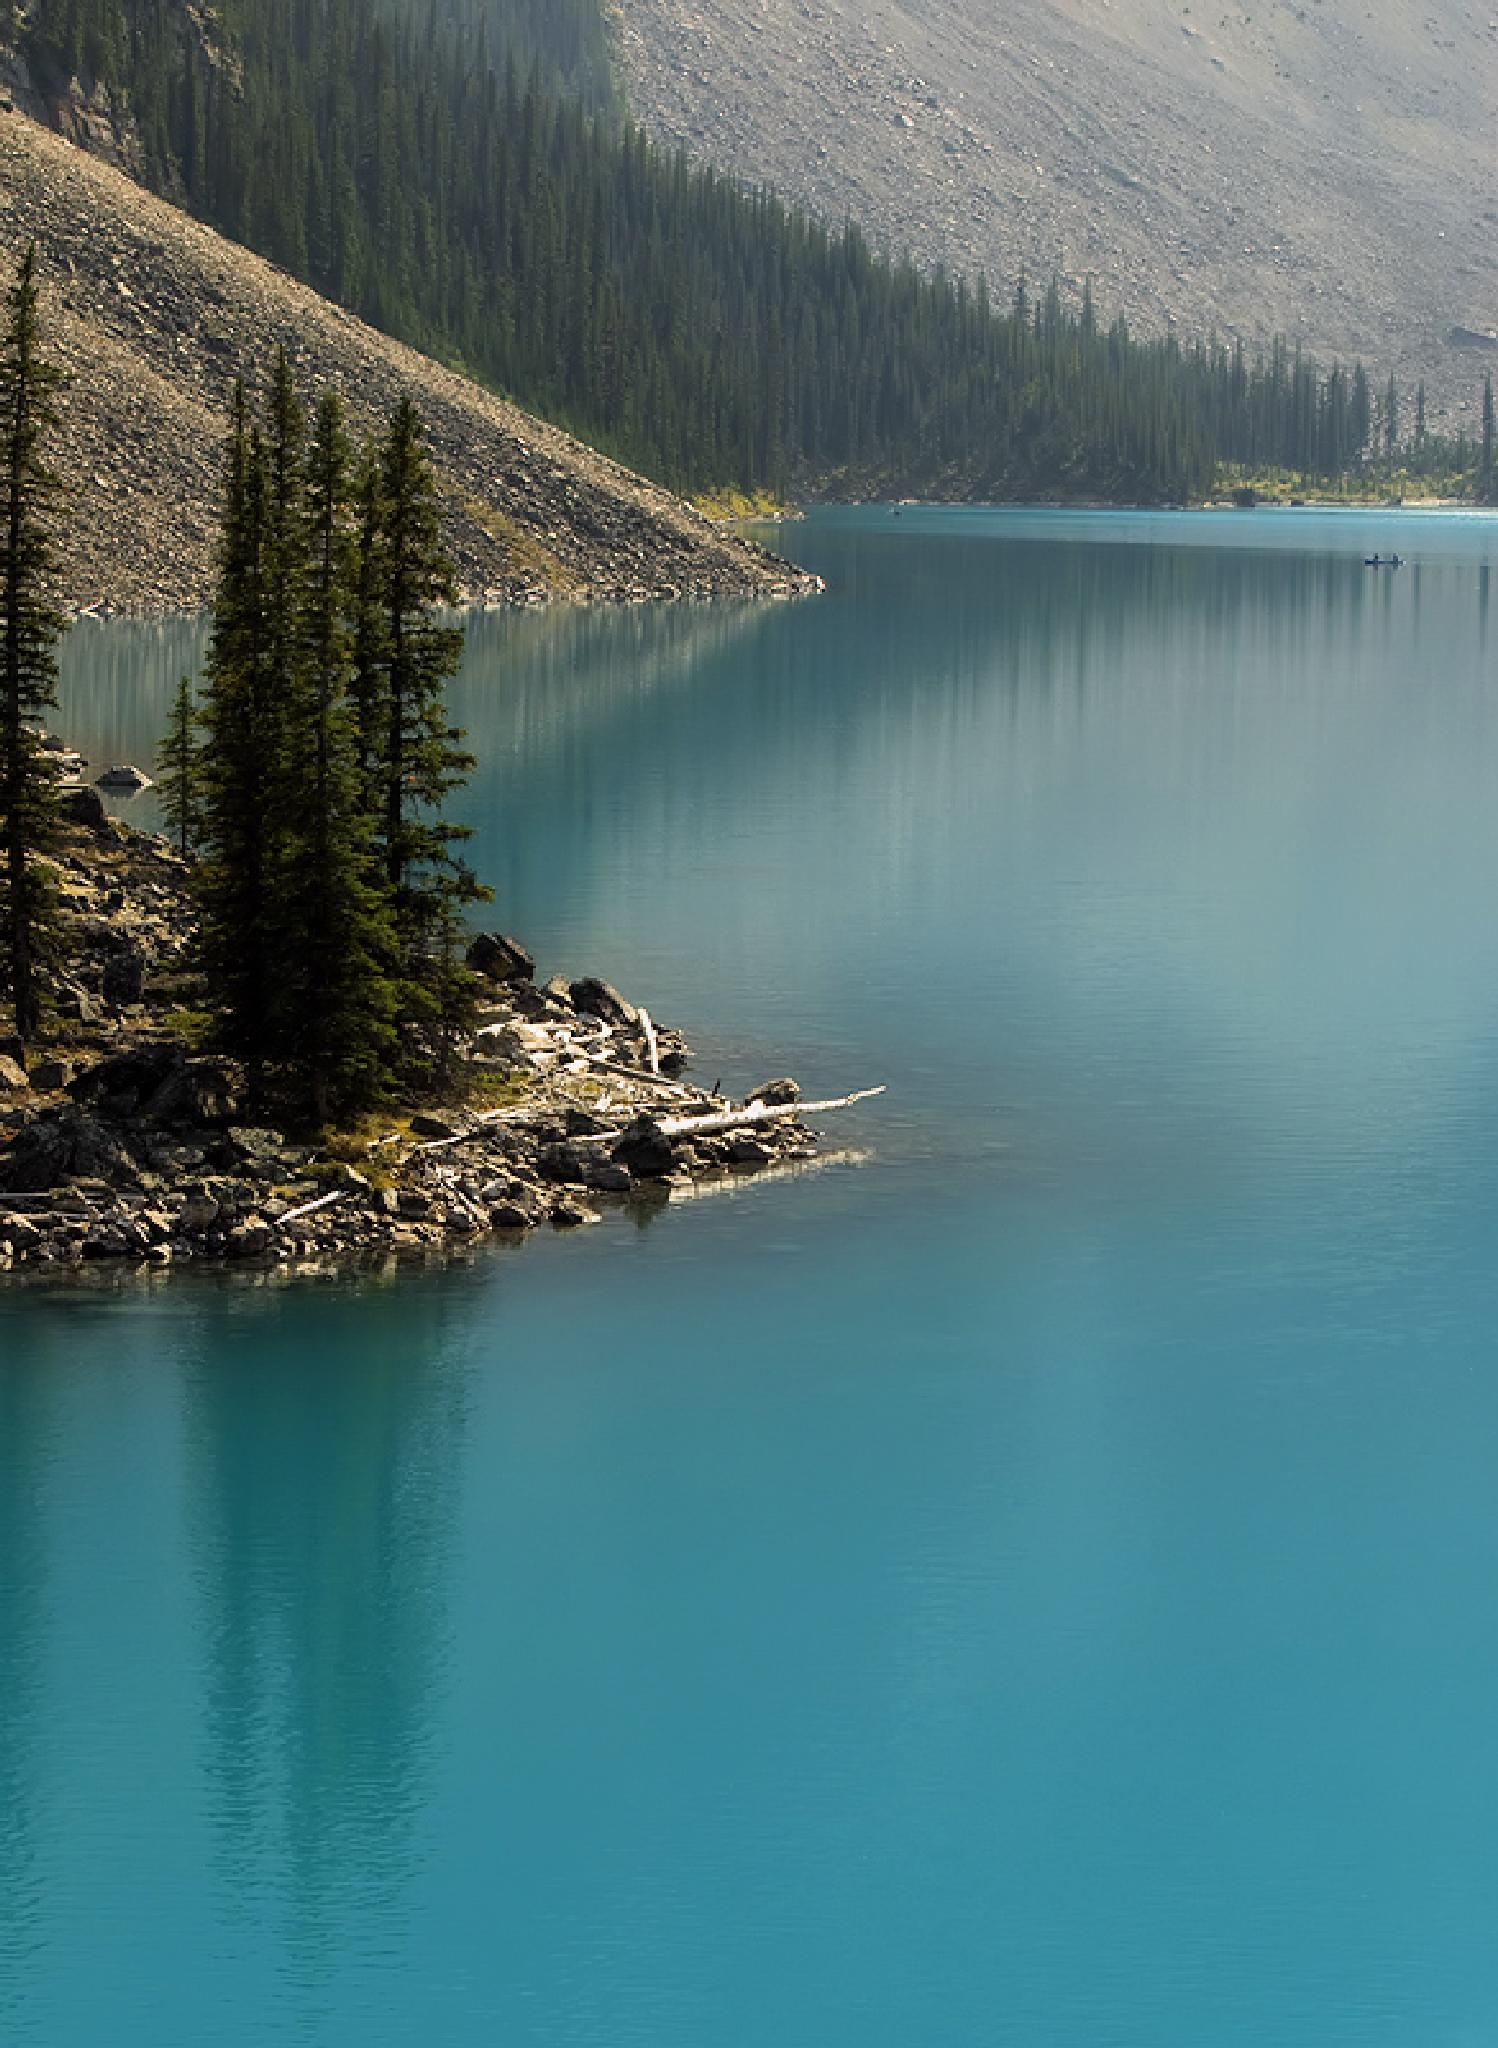 Moraine lake by MadeleineGuenette